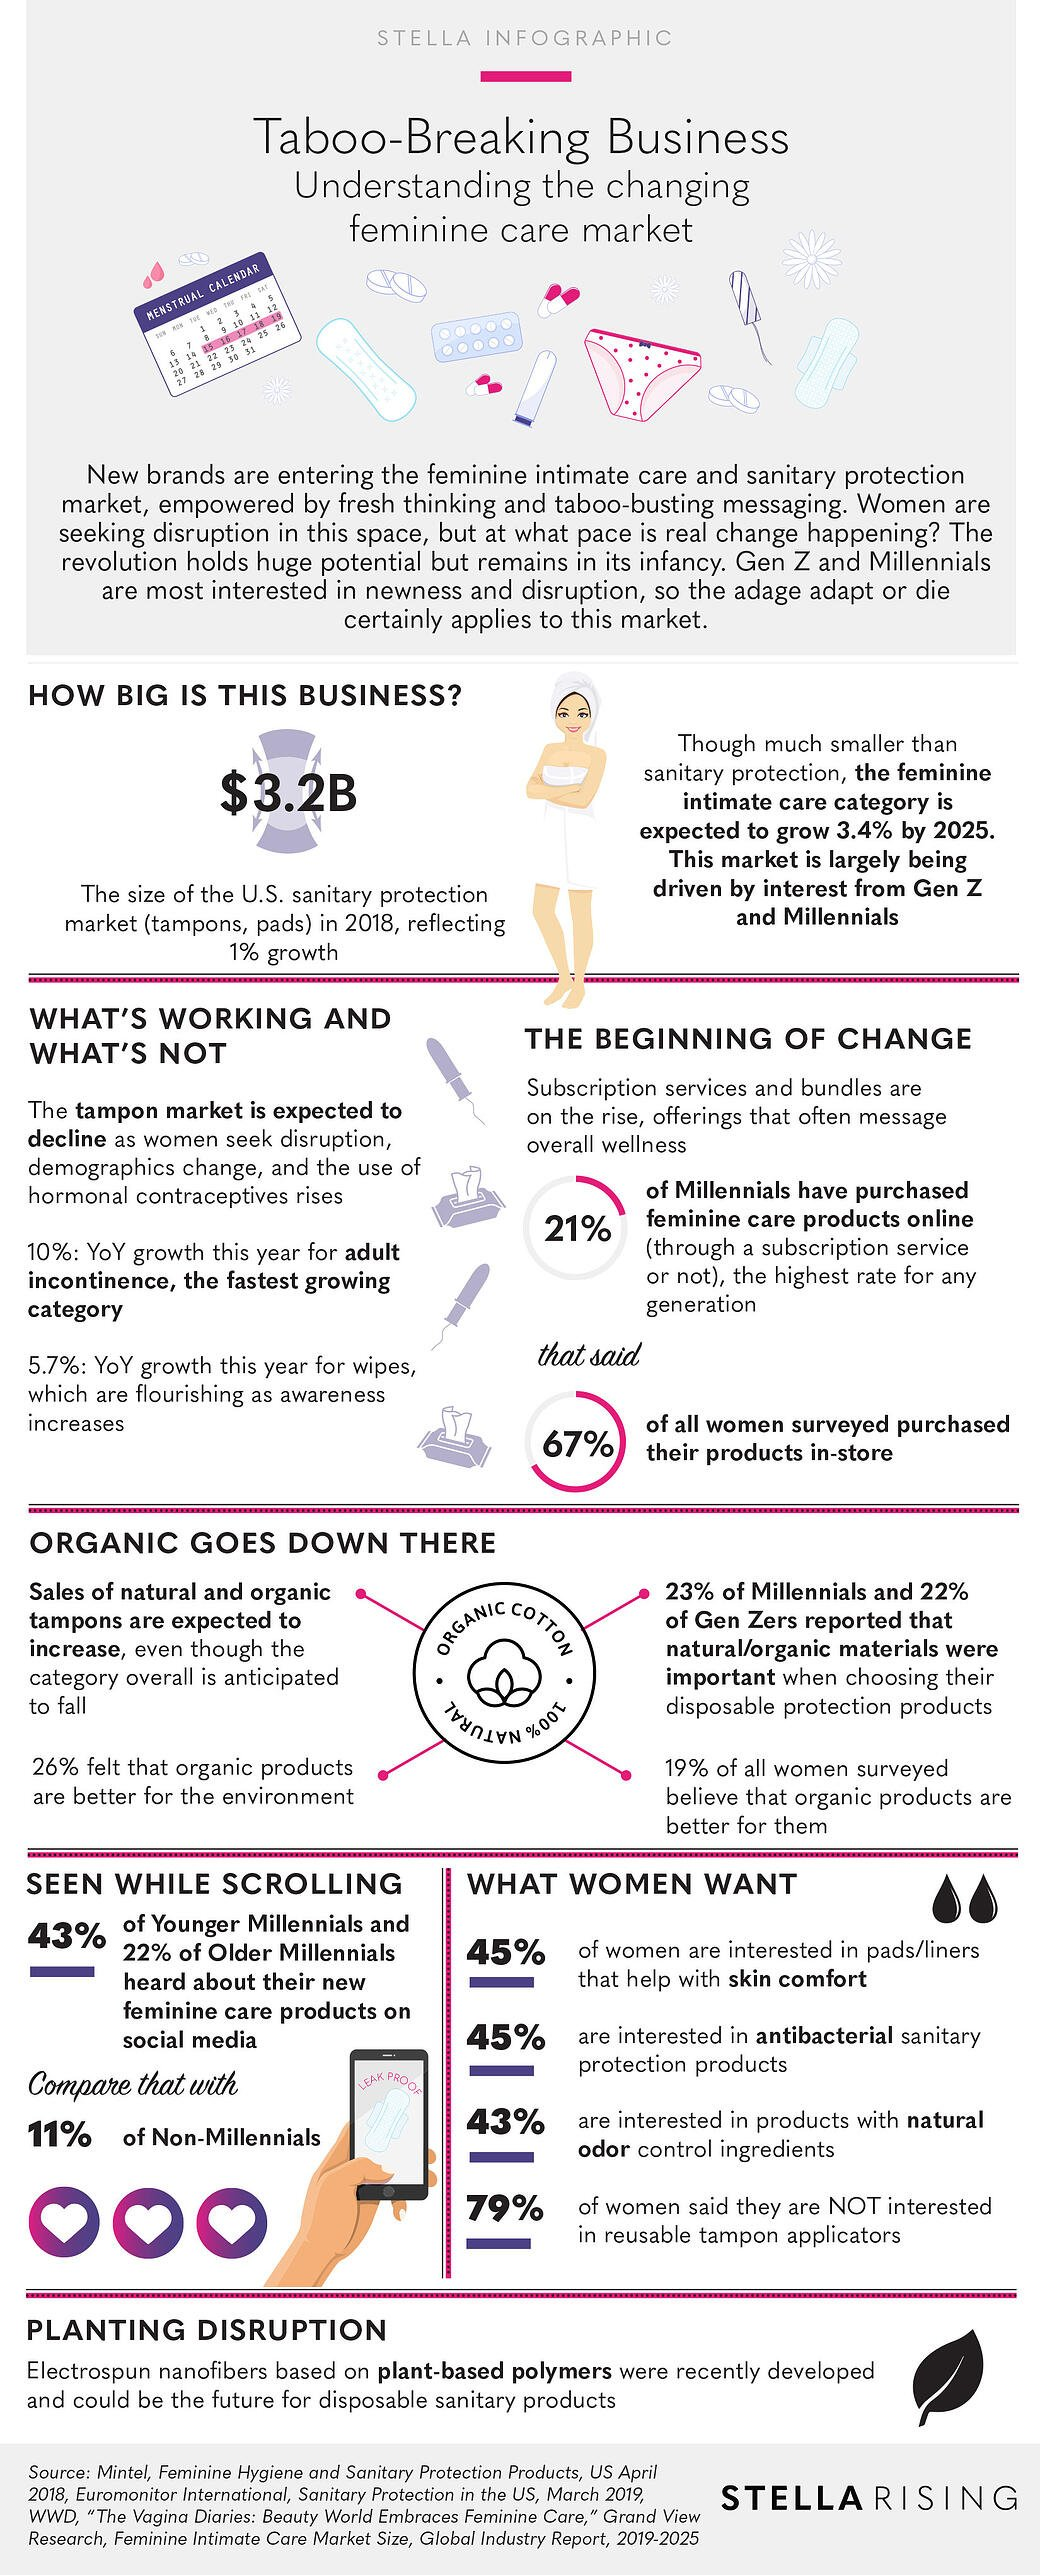 FeminineHygieneCare_Infographic